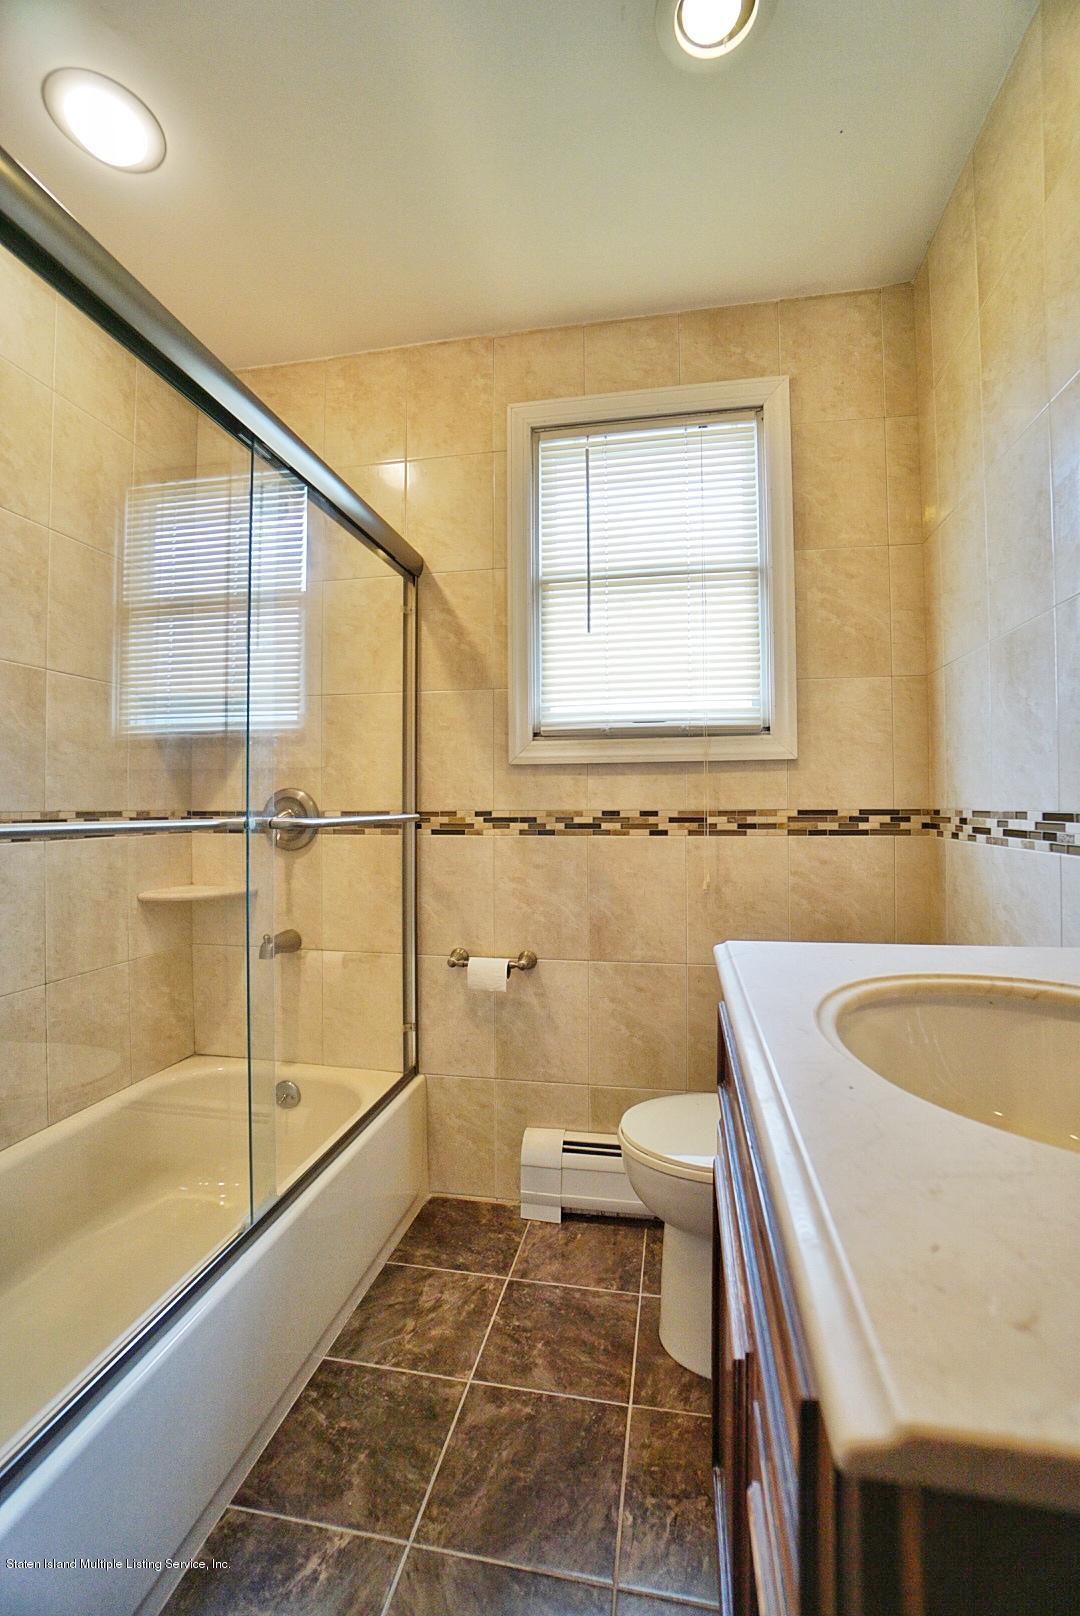 Single Family - Detached 55 Lyndale Avenue  Staten Island, NY 10312, MLS-1128769-8